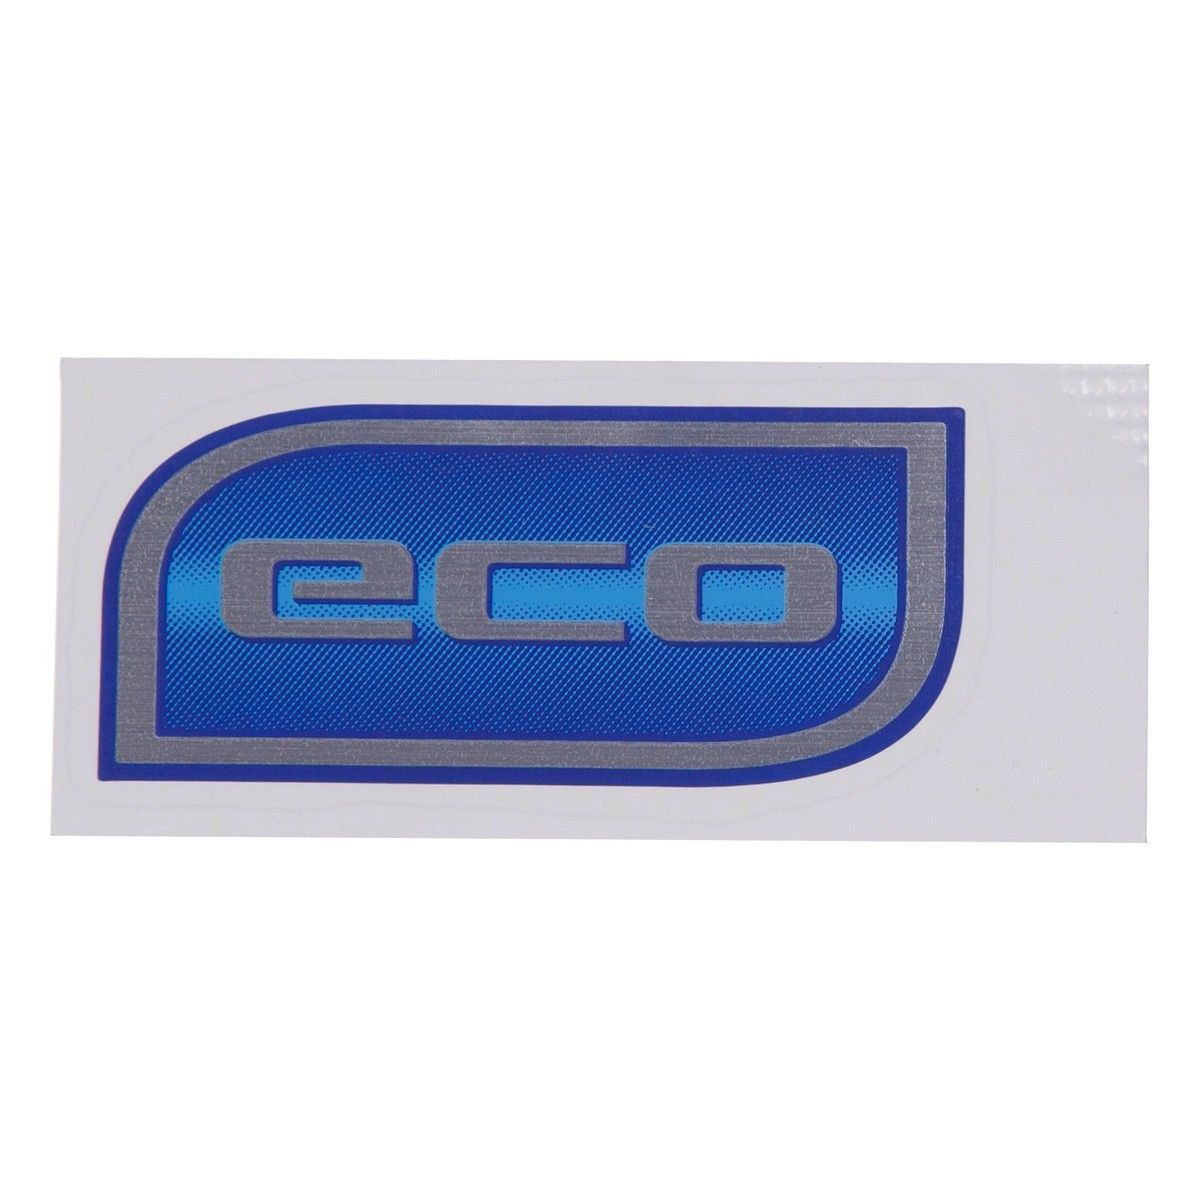 Emblema *Eco* da tampa traseira porta malas - Onix 2017 a 2019